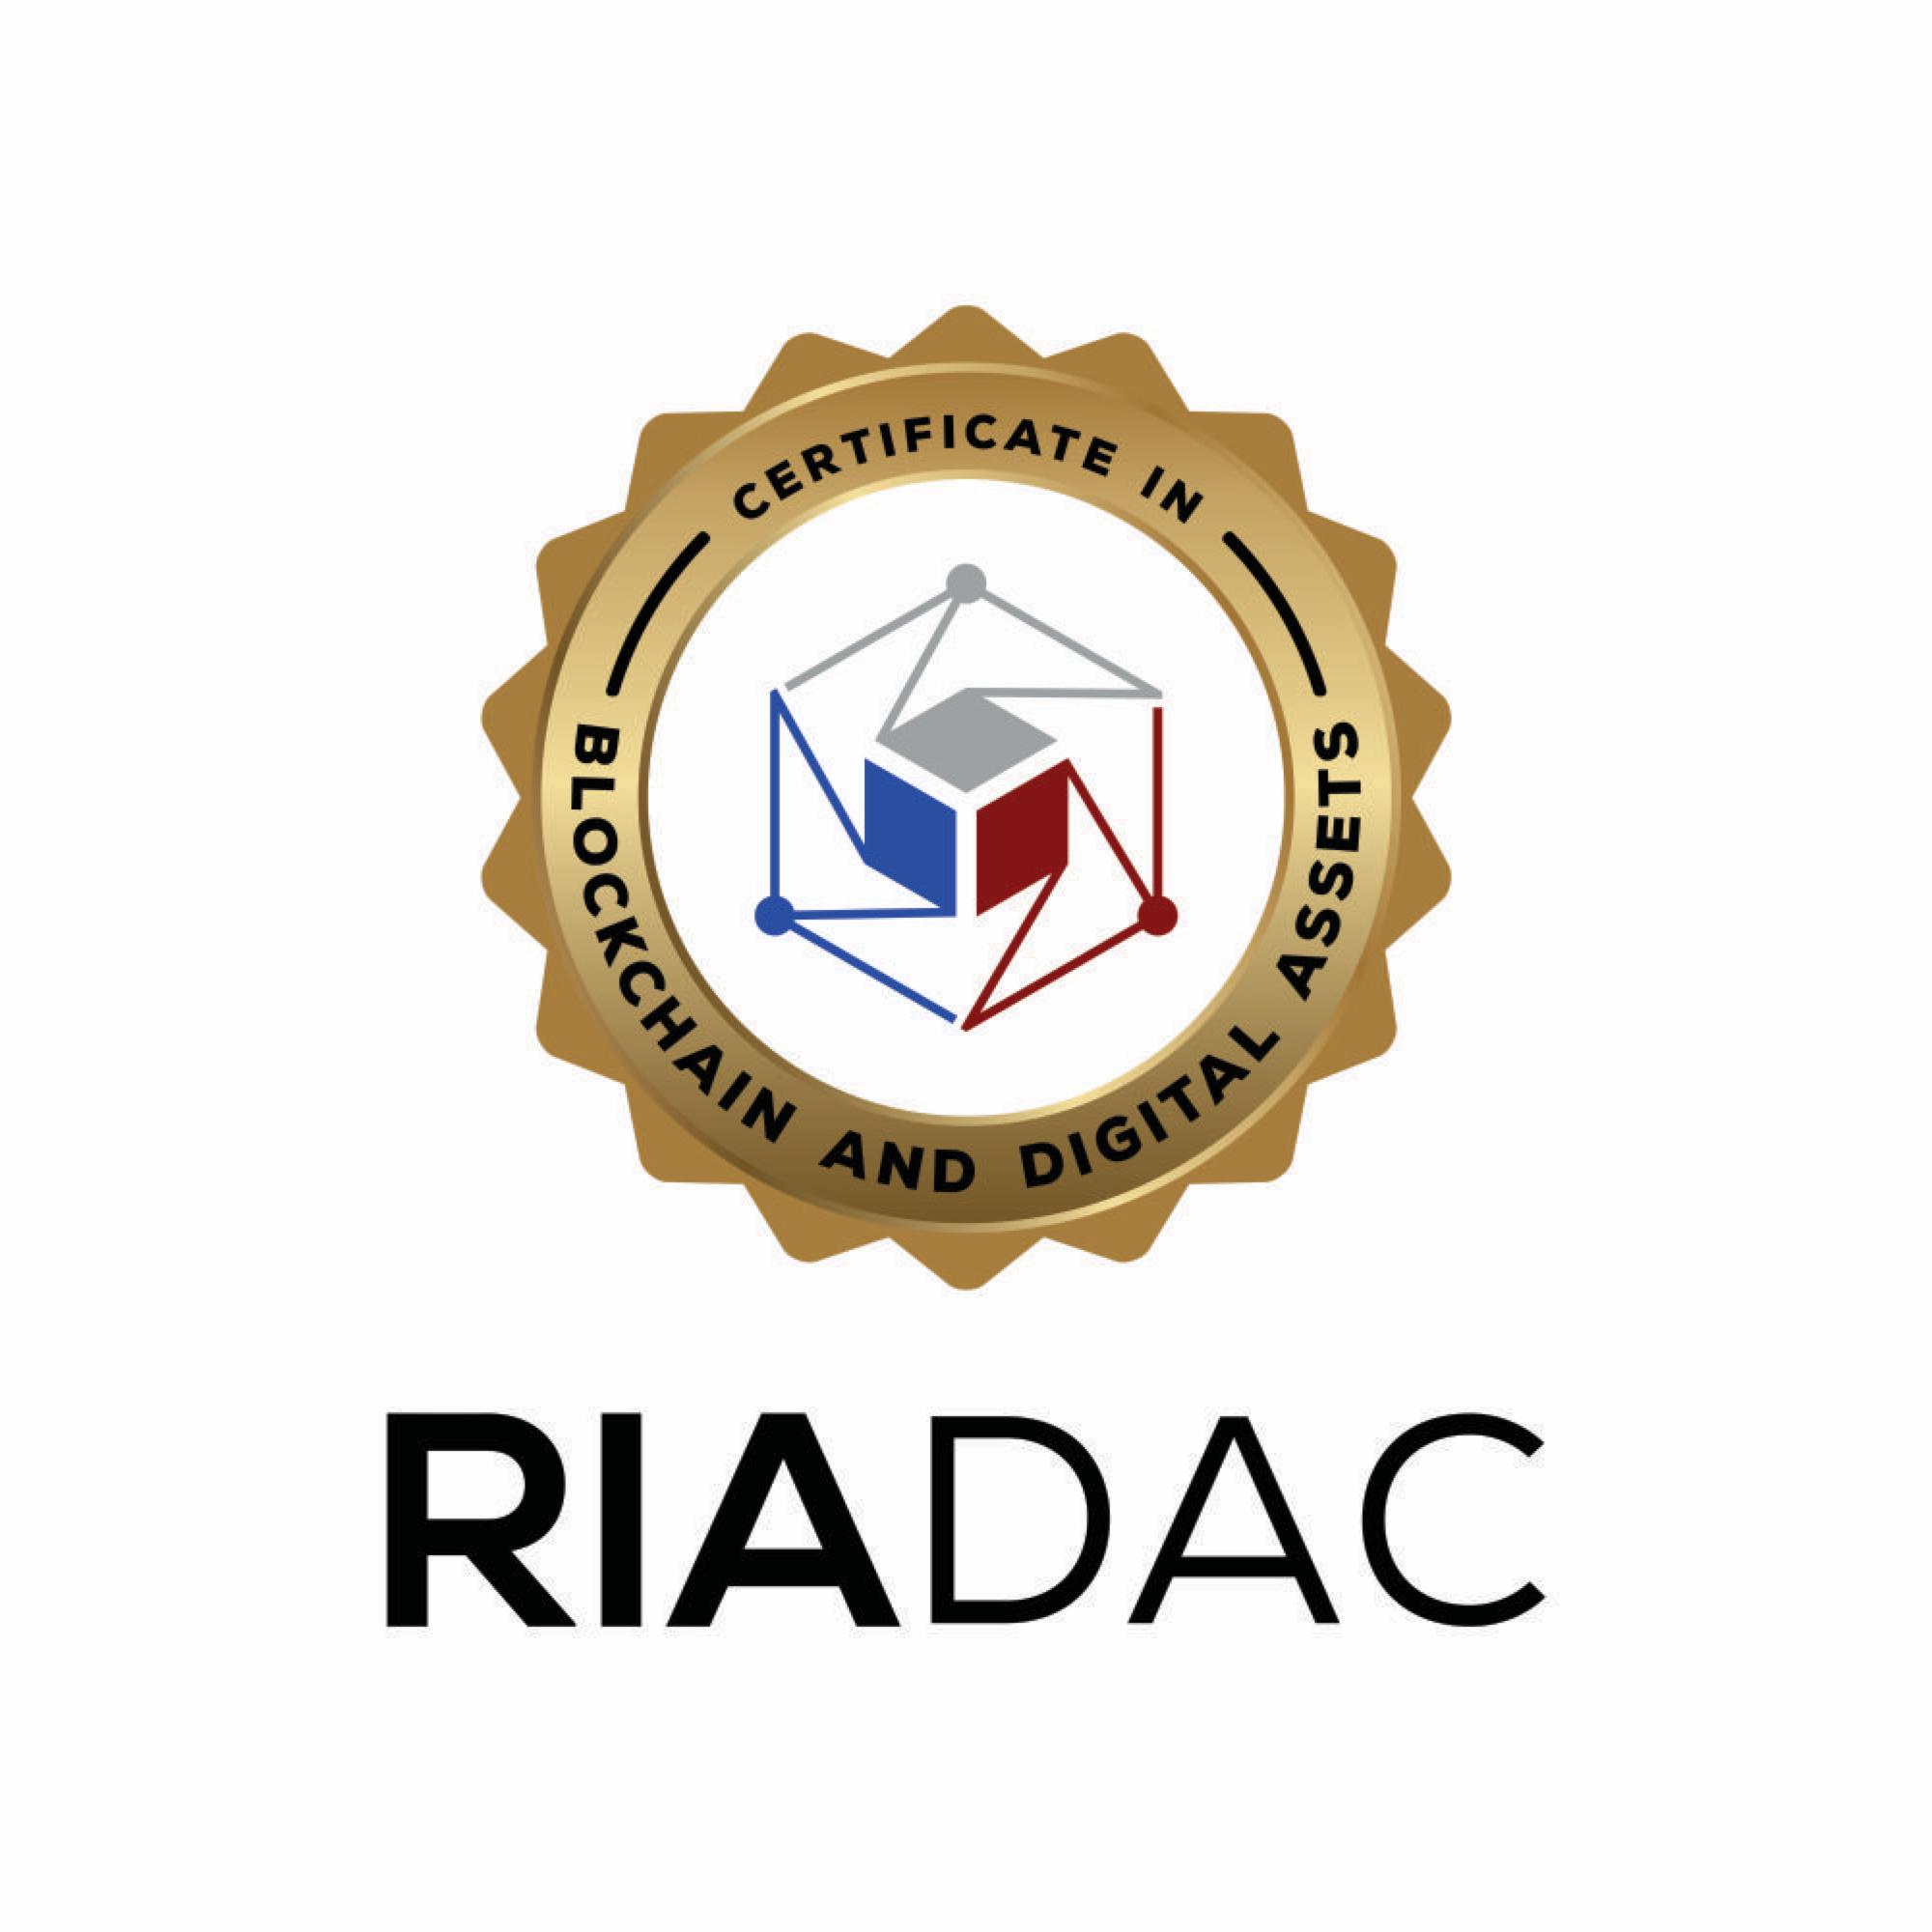 Digital Wealth - RIADAC Certificate in Blockchain and Digital Assets®